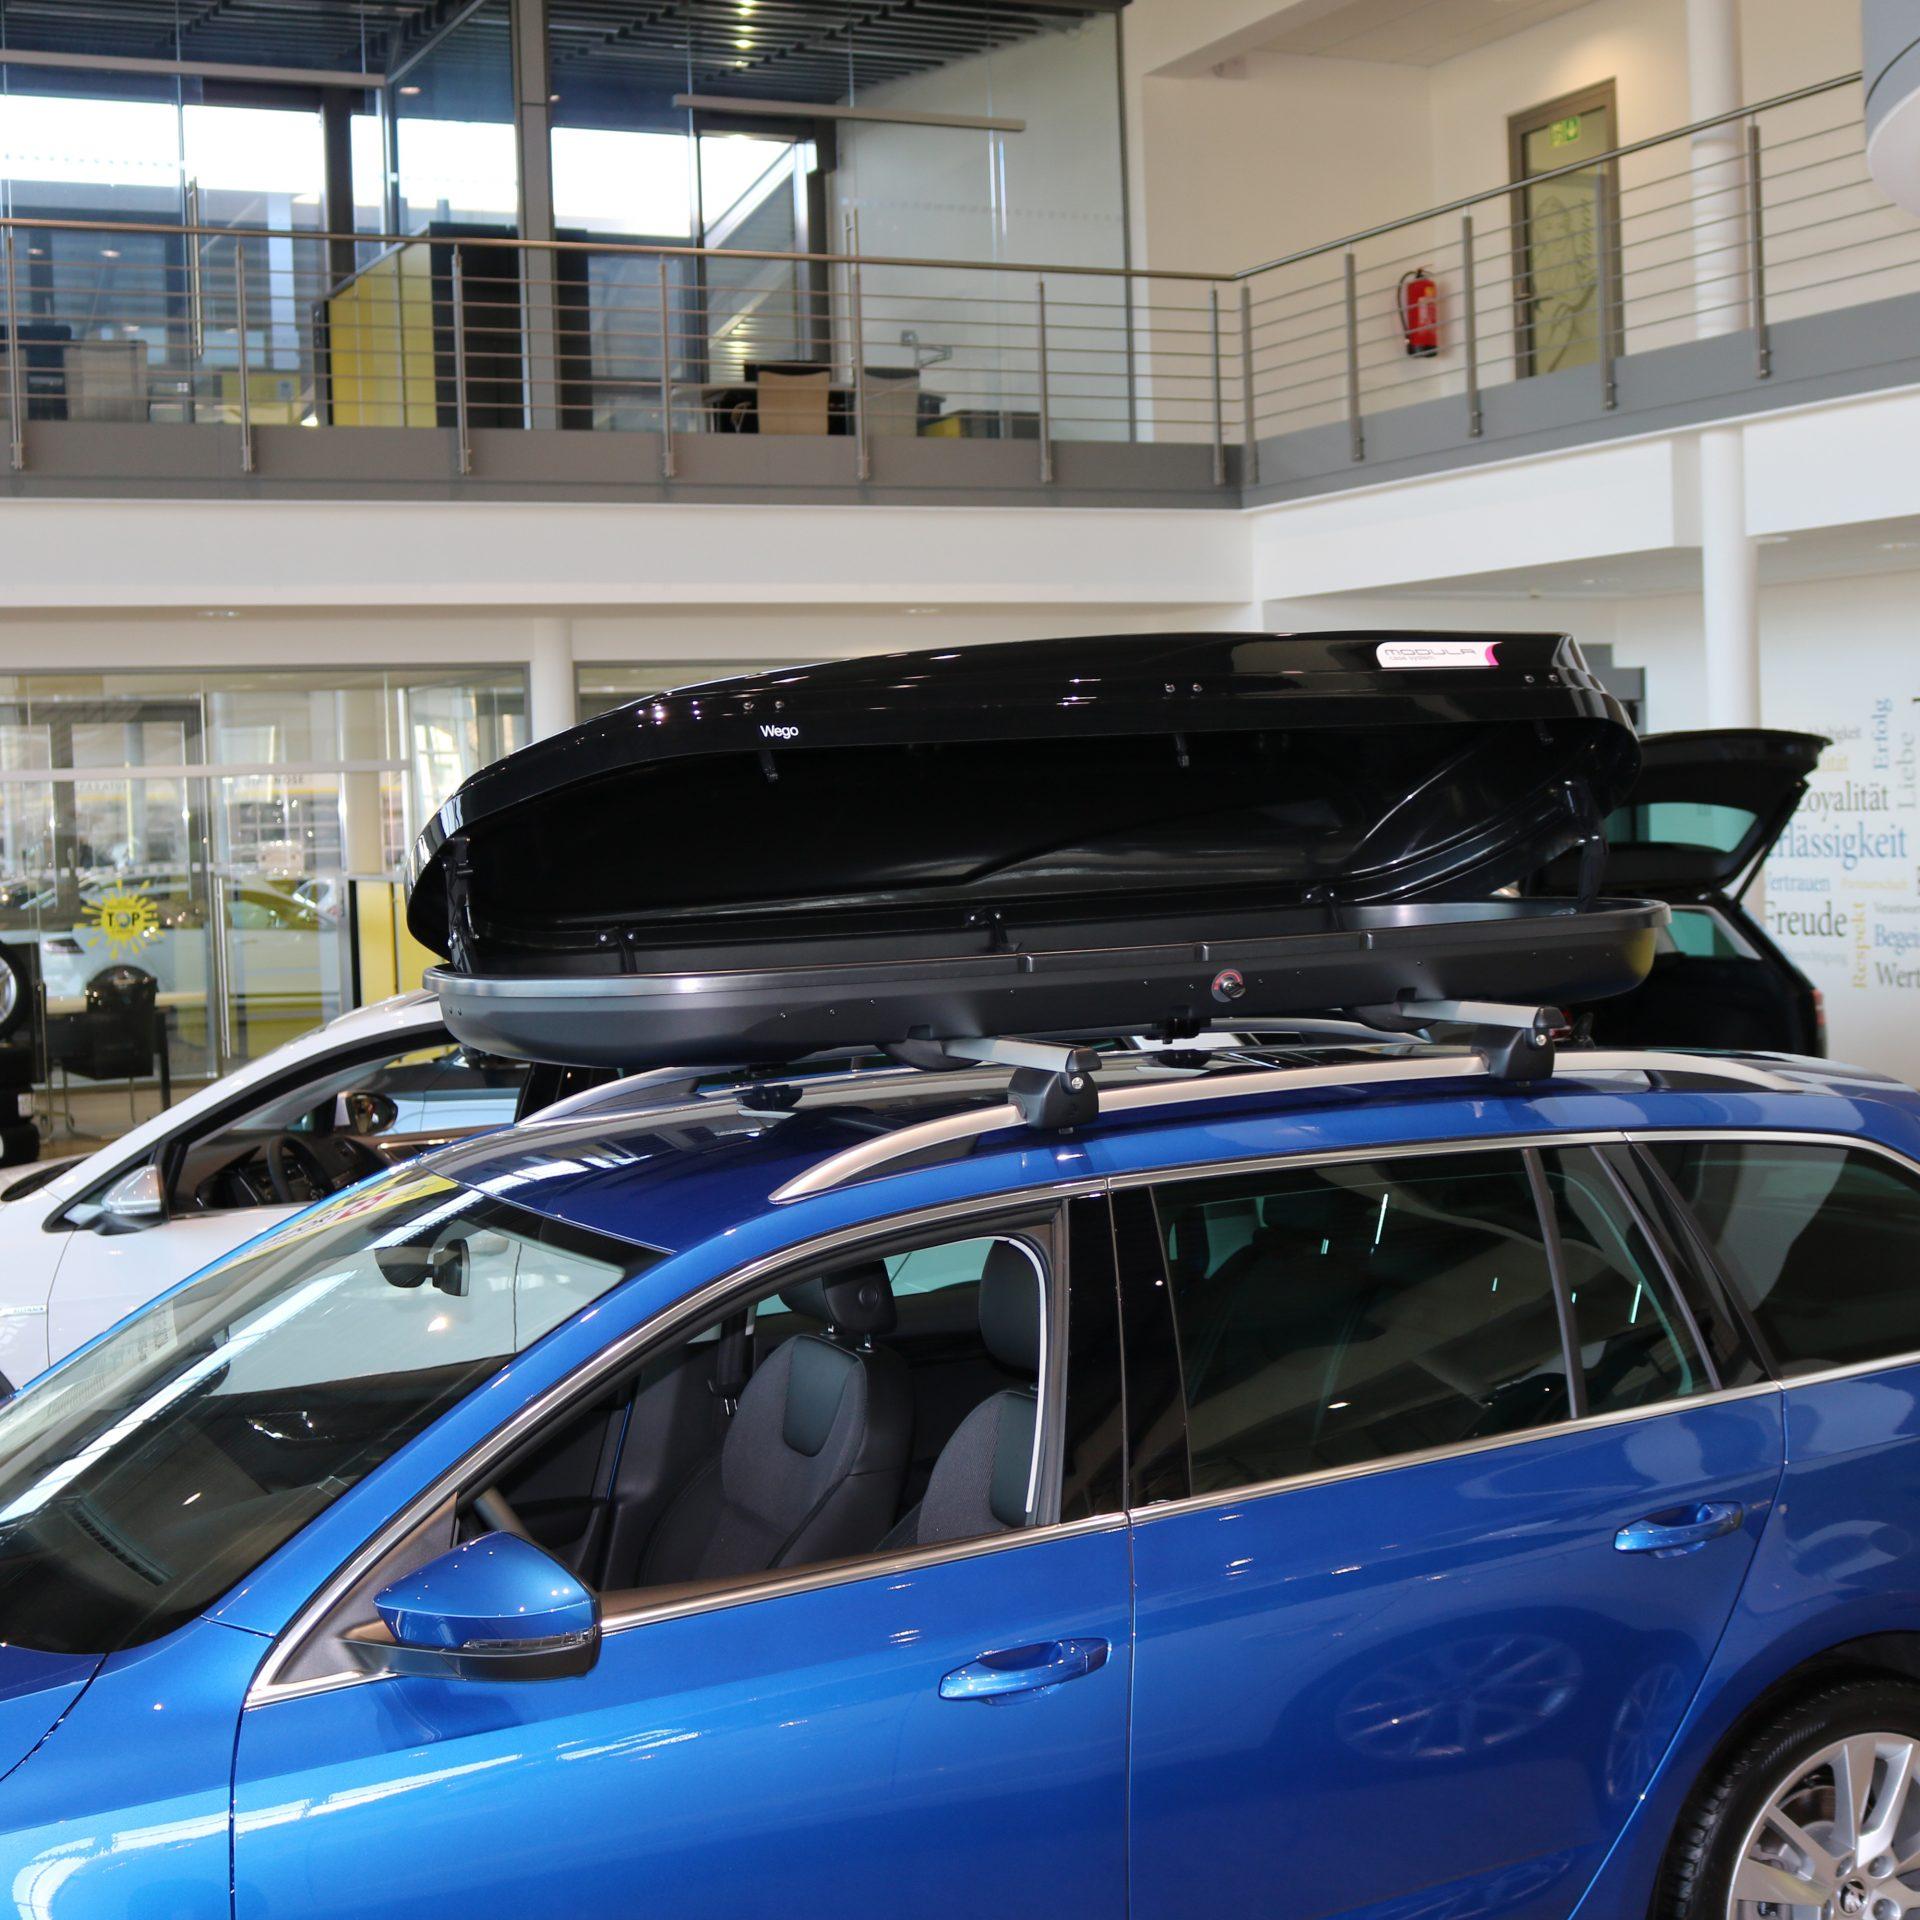 Dachbox Modula Wego Black - Auto Welt von Rotz AG 3